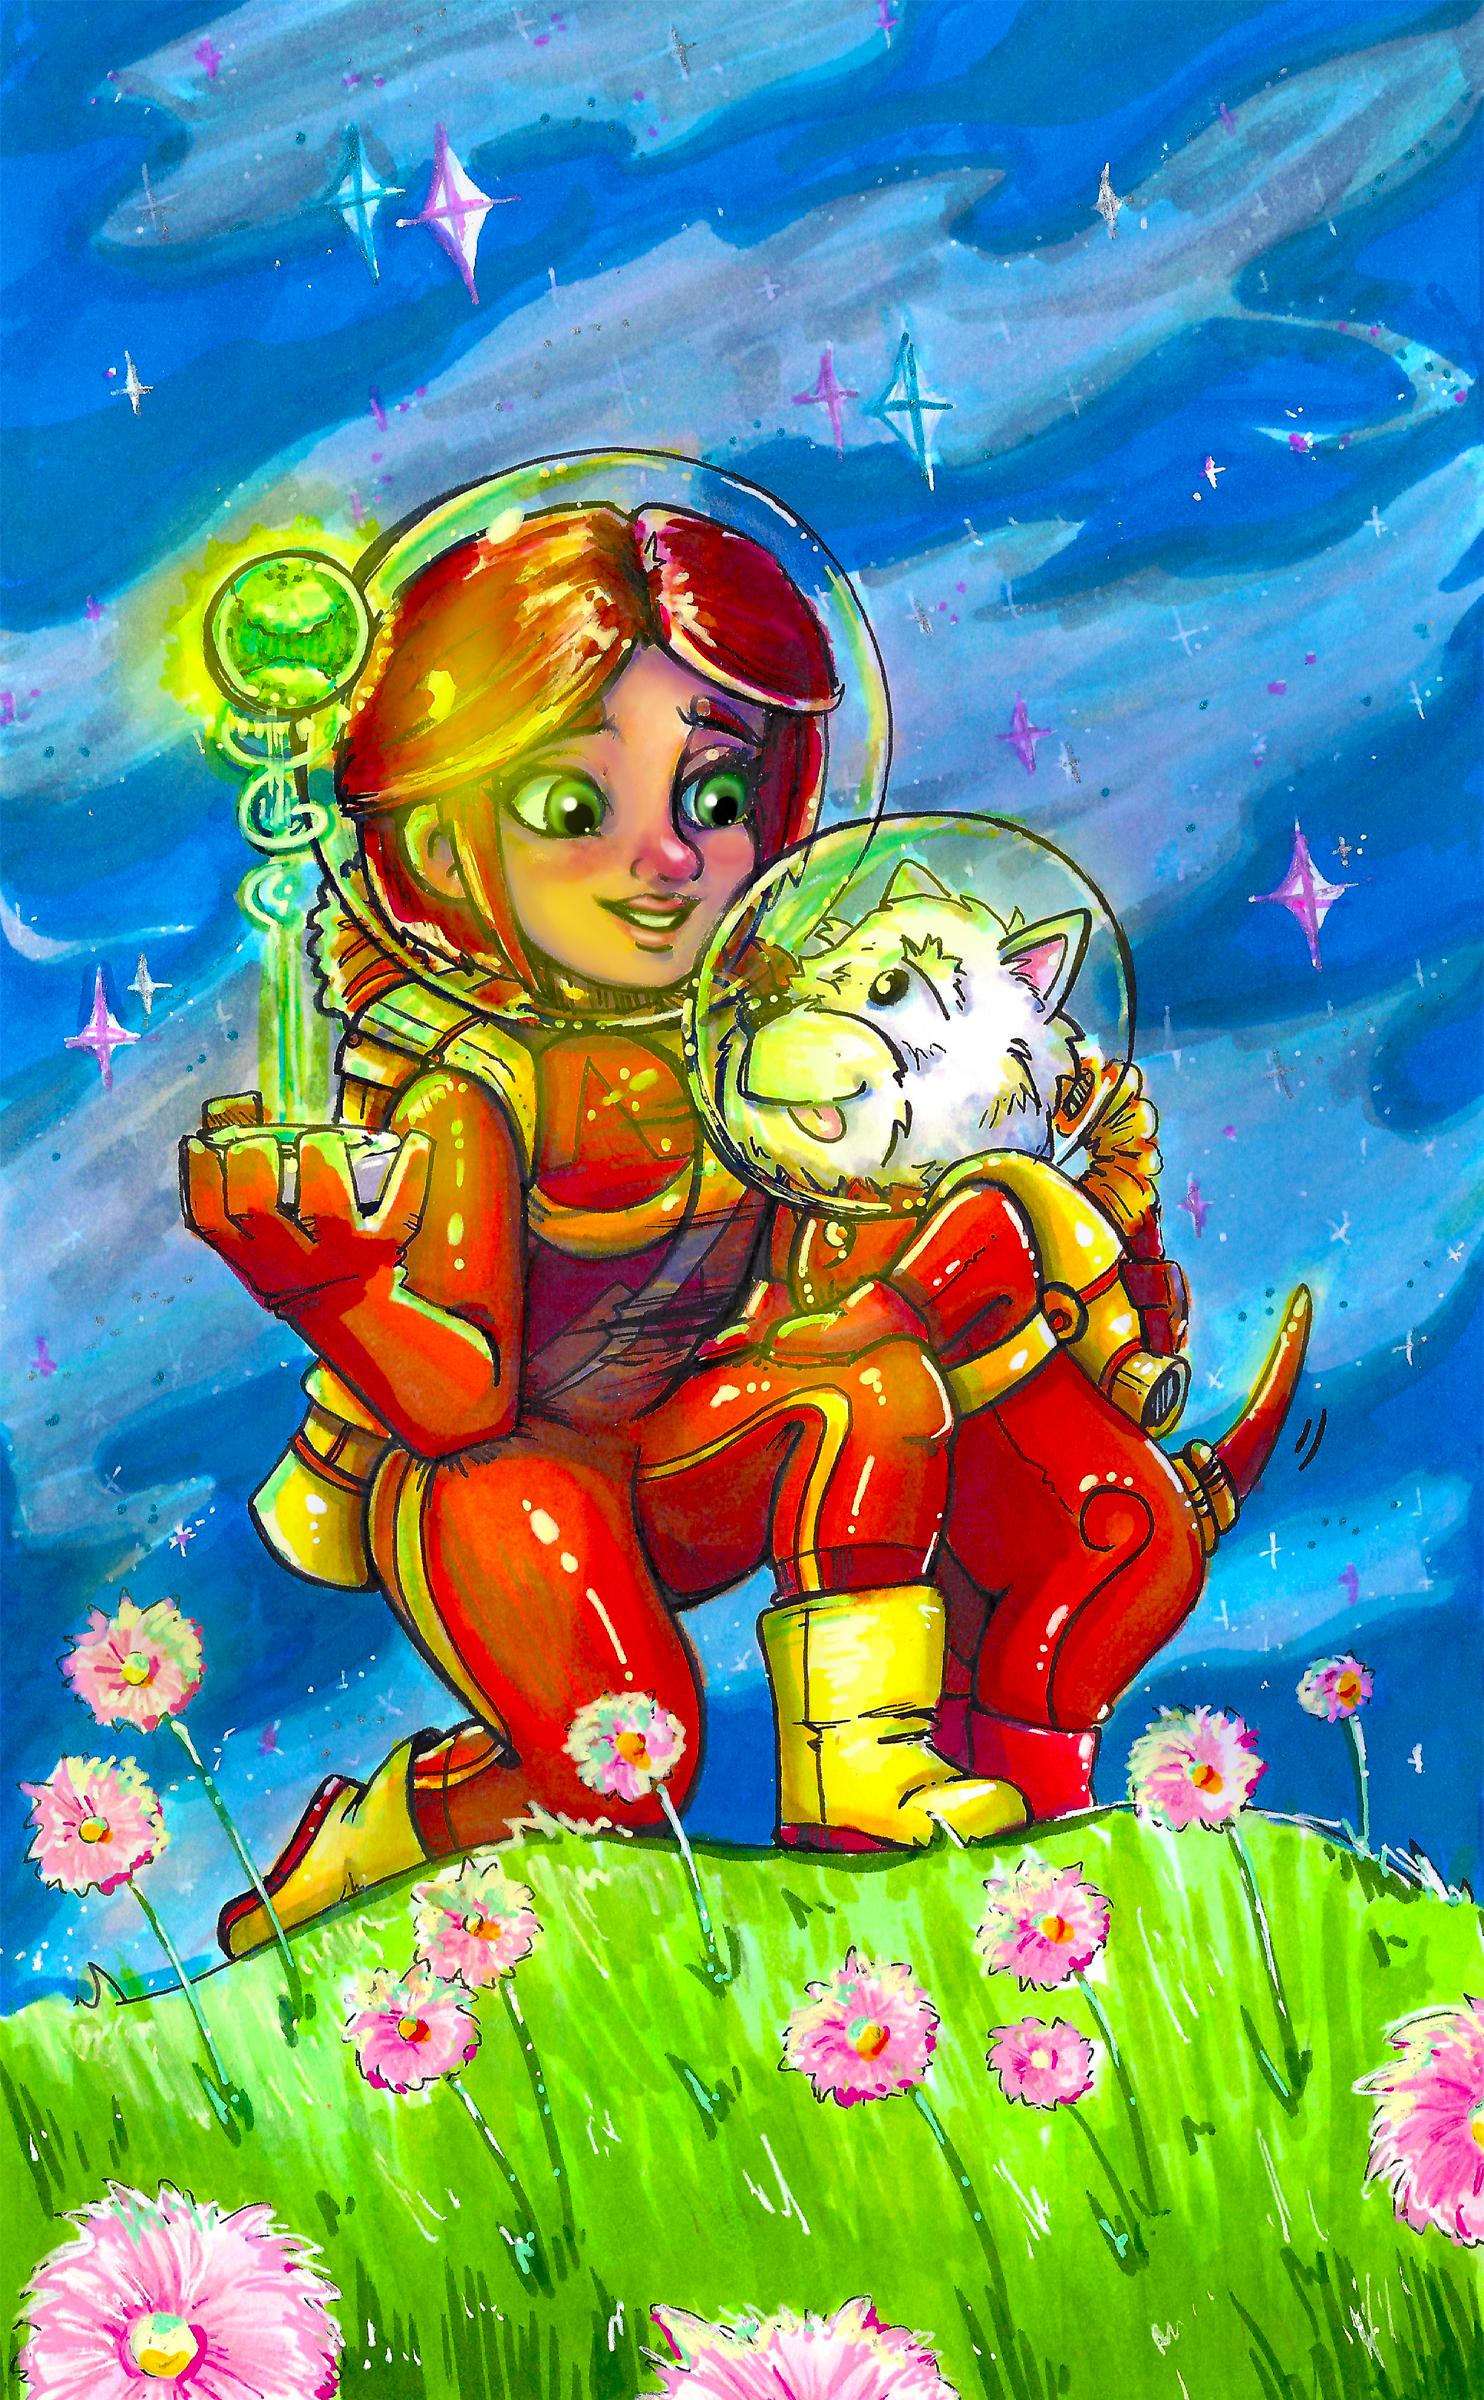 Space Explorer #9